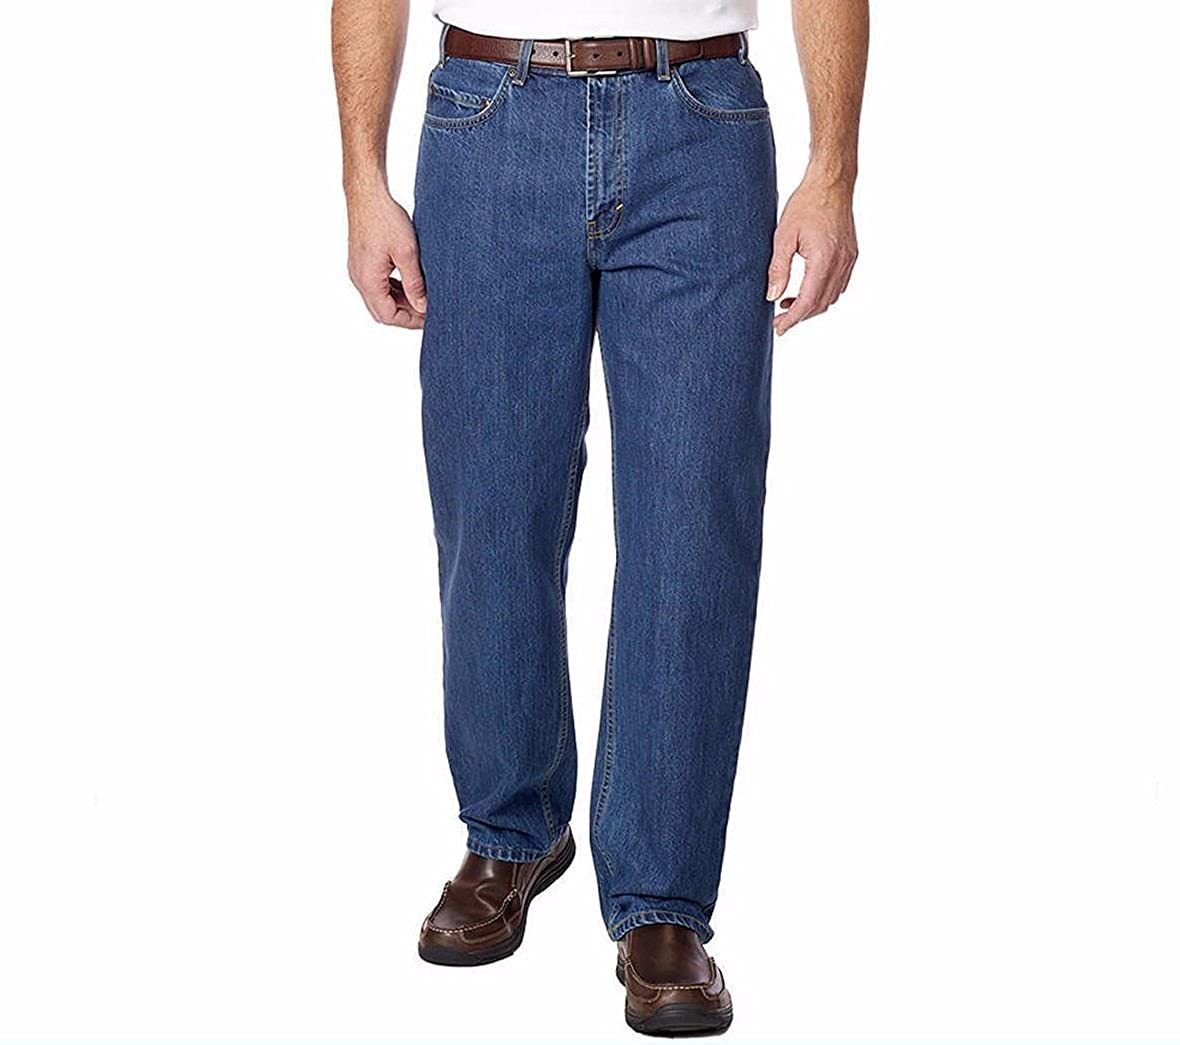 k s Kirkland List price Signature Mens Jeans 40x32 Relaxed Wash Max 70% OFF Light Waist